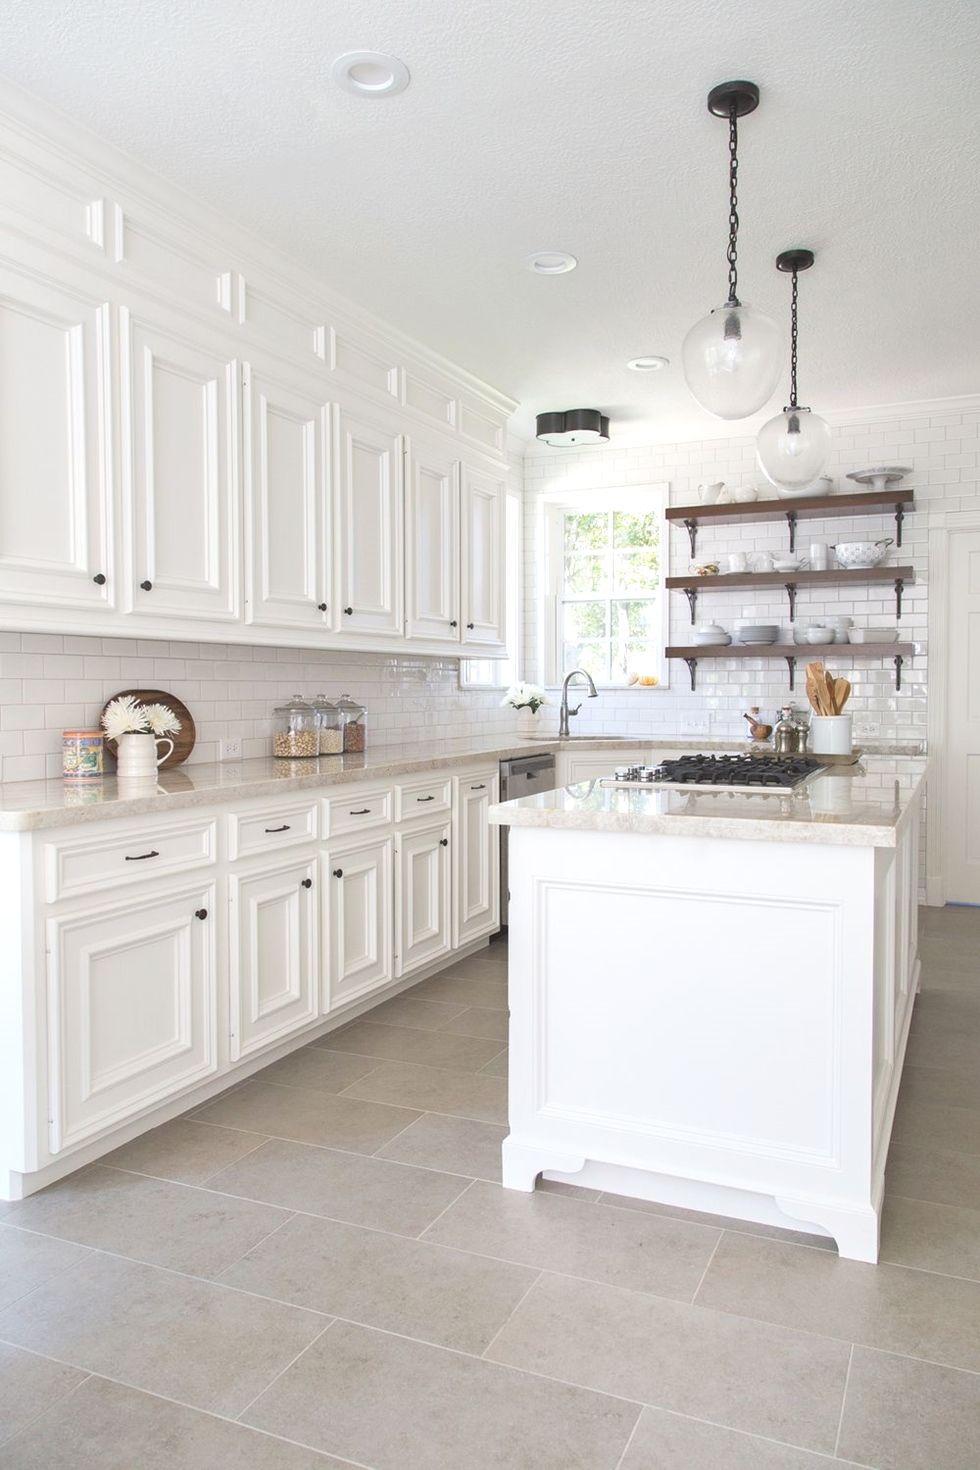 kitchen remodeling rochester ny #kitchenremodeling | kitchen